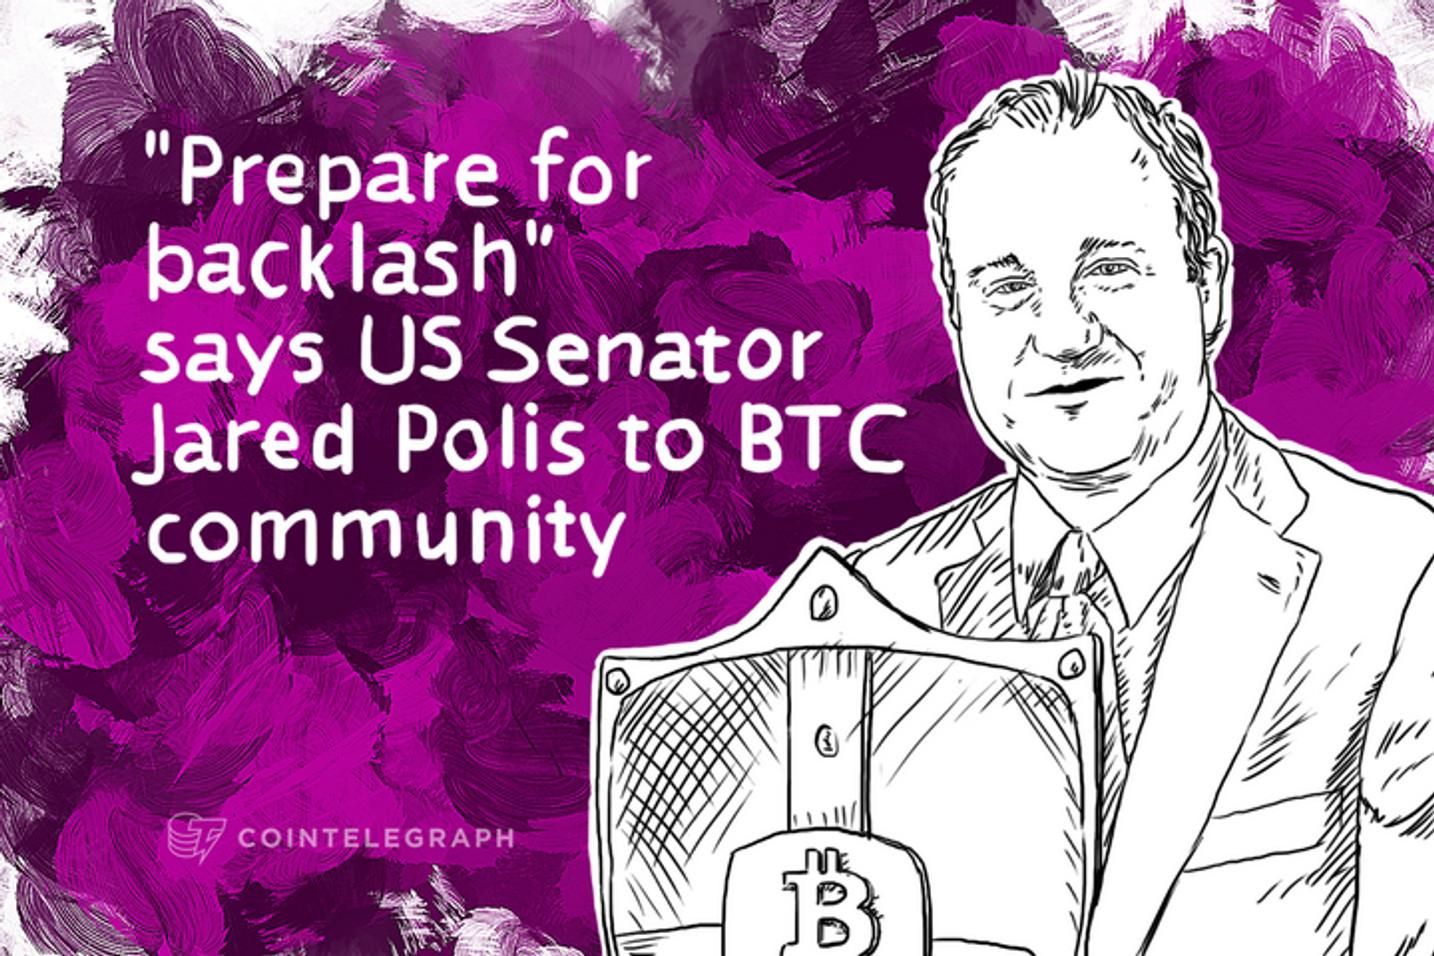 """Prepare for backlash"" says US Senator Jared Polis to BTC community"